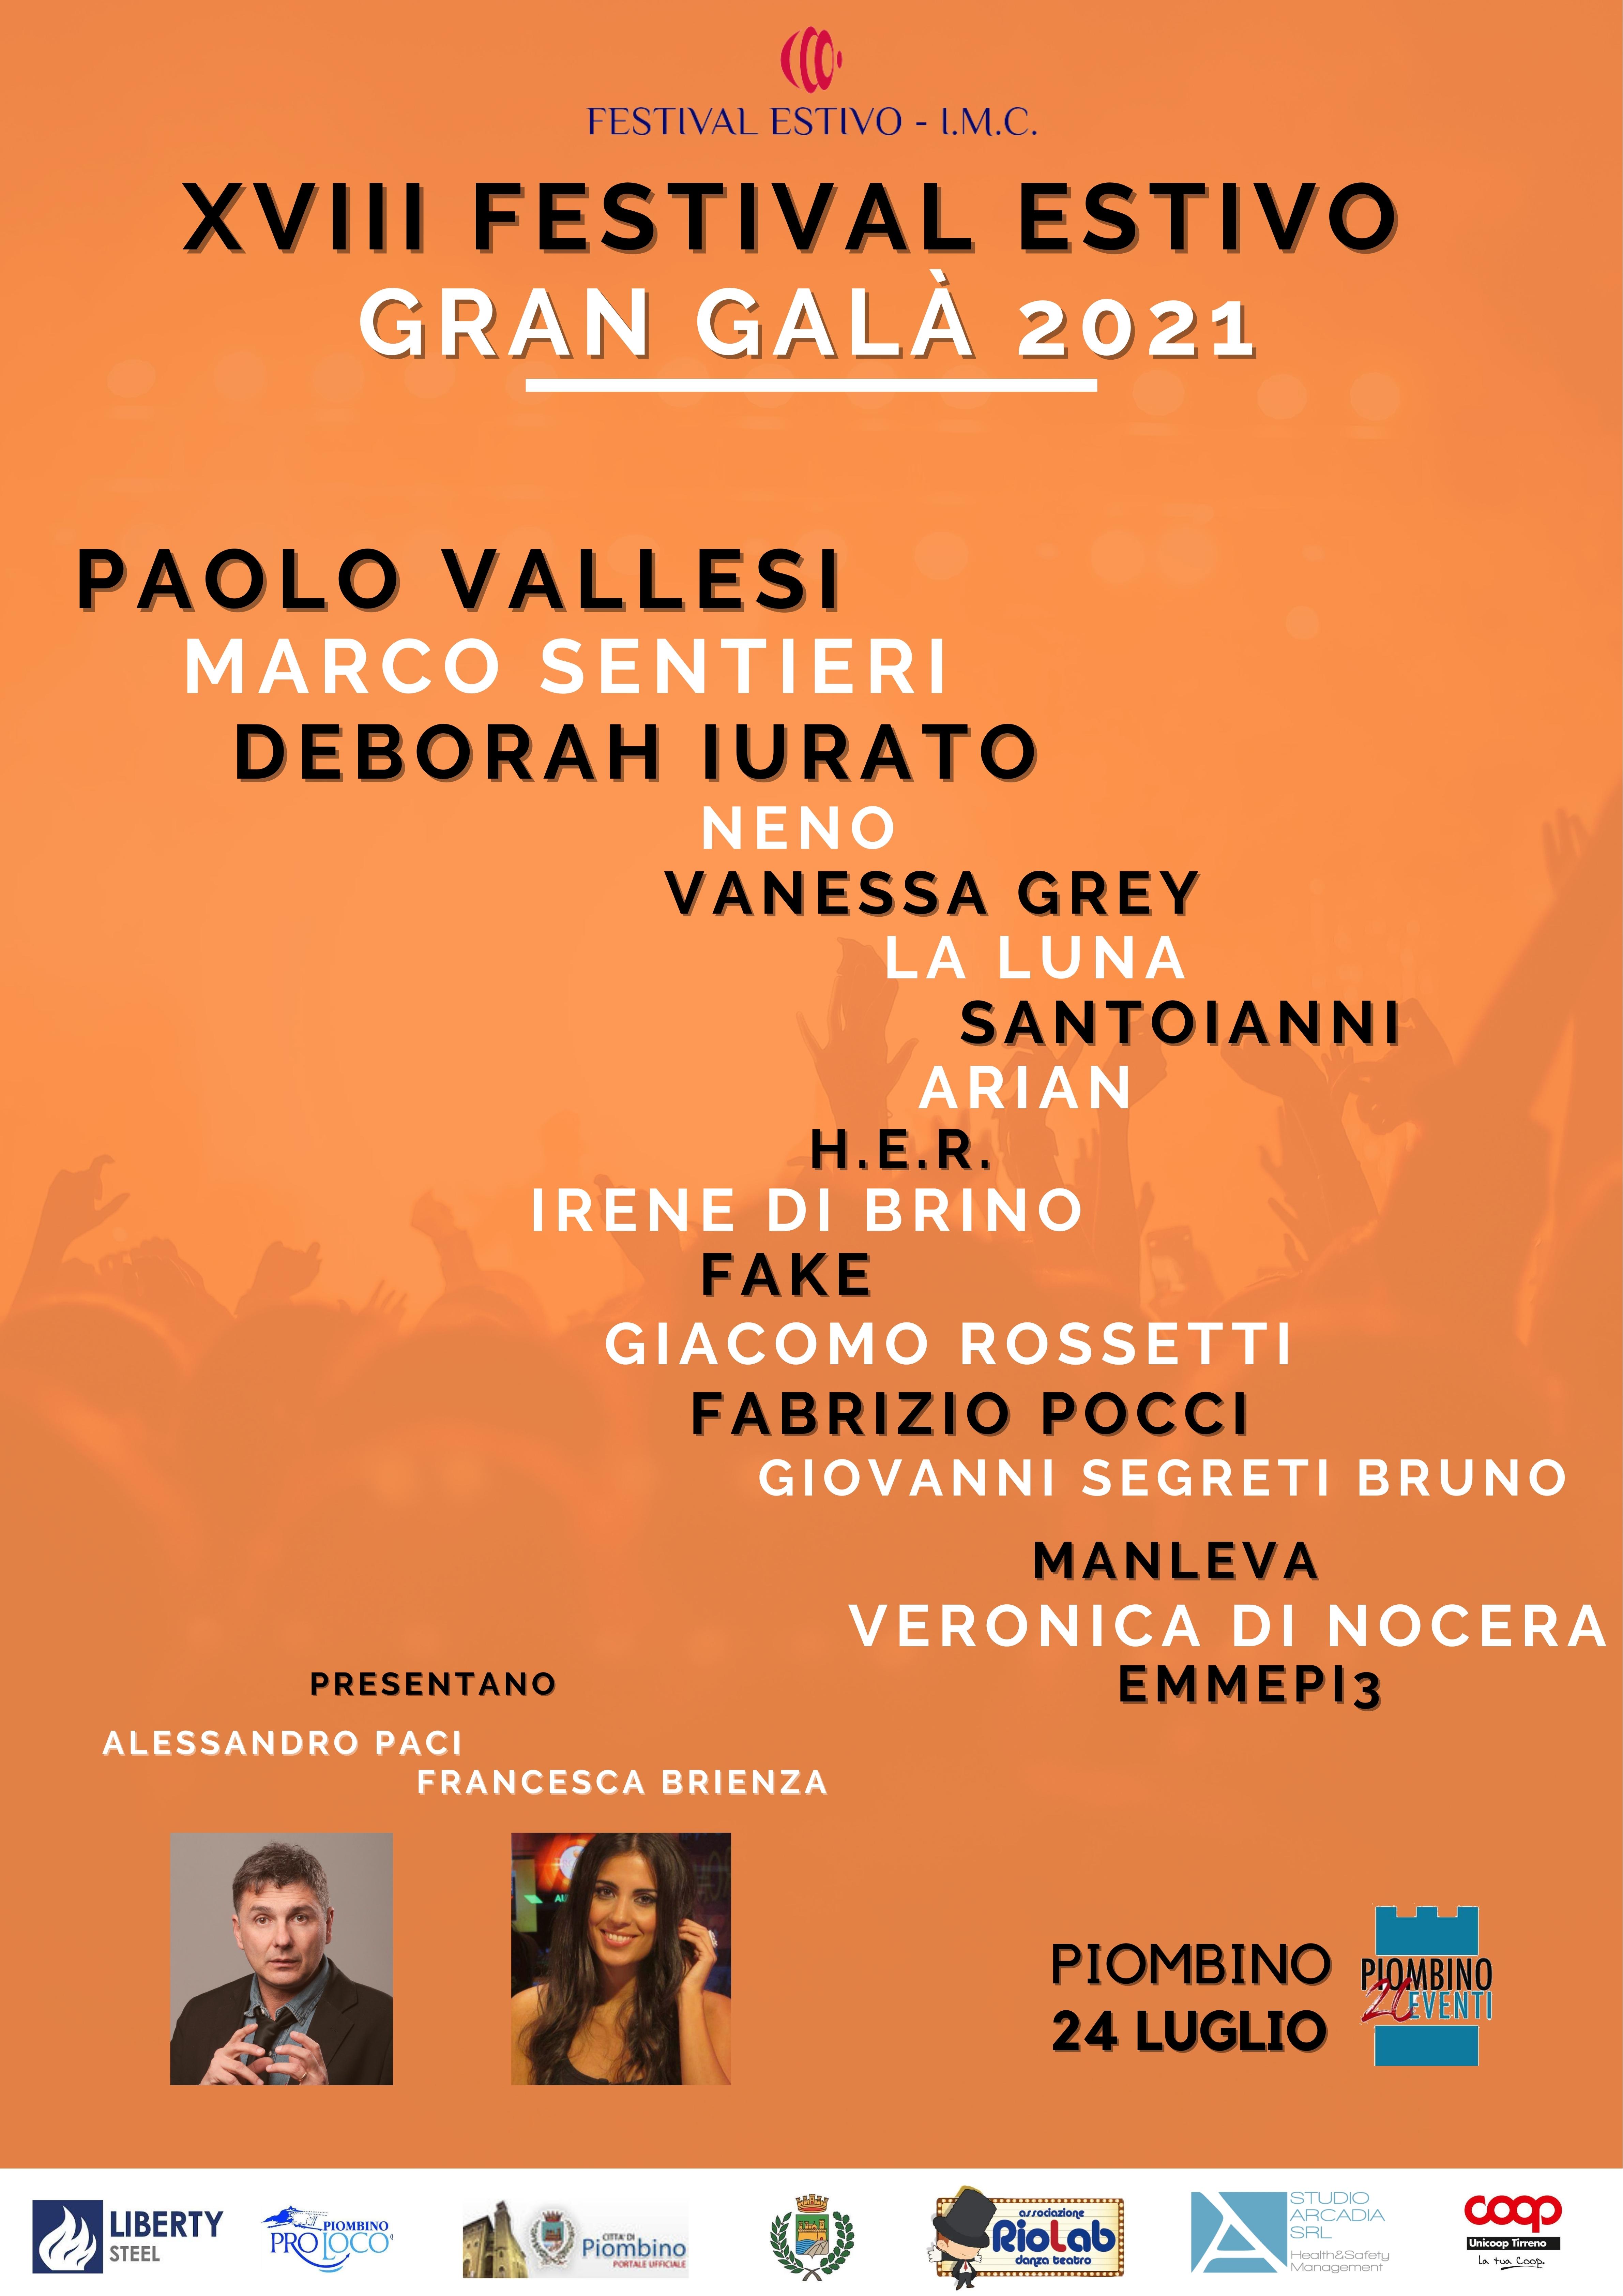 XVIII FESTIVAL ESTIVO – GRAN GALA' 2021